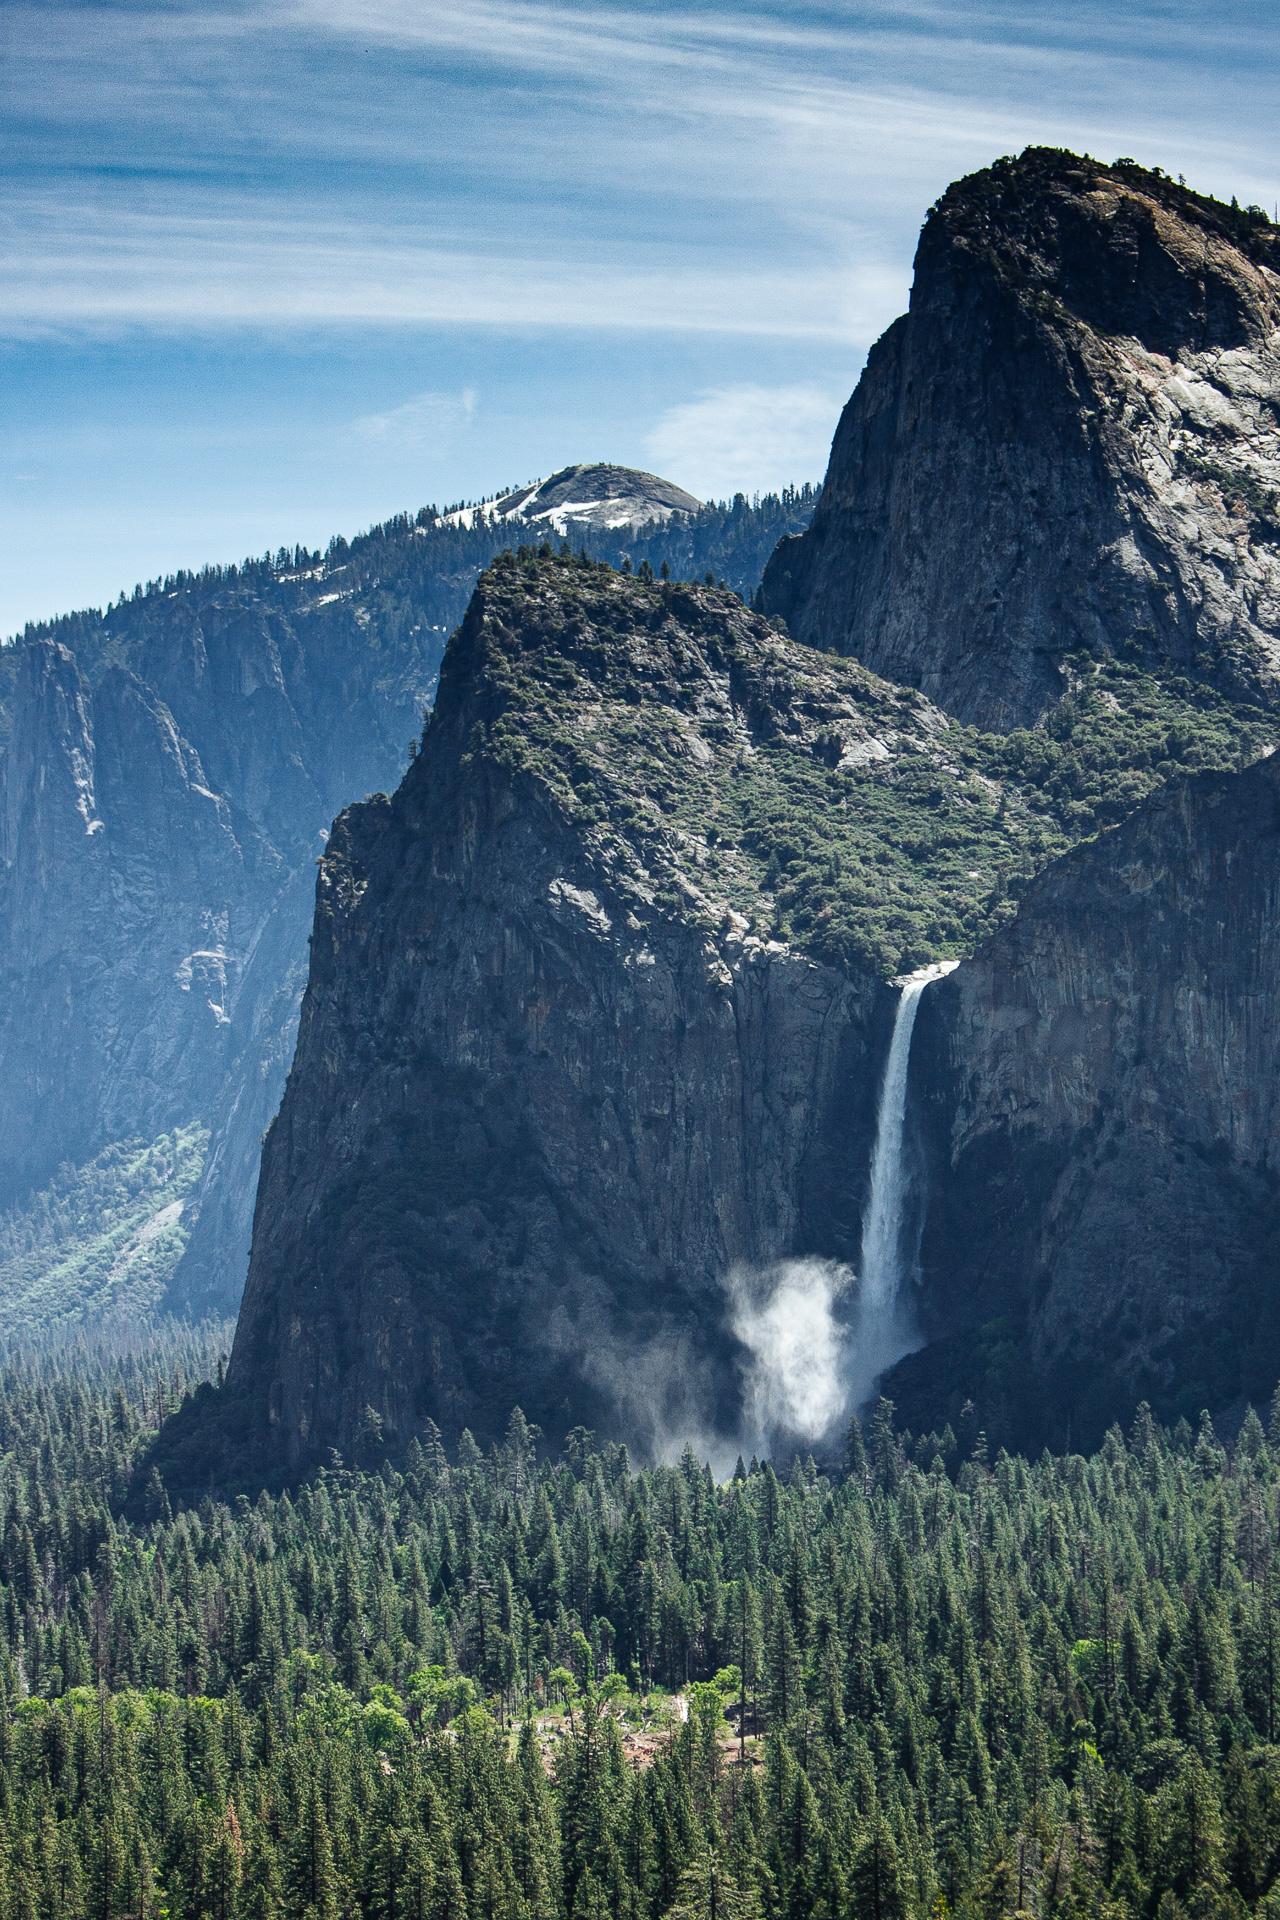 yosemite, Yosemite